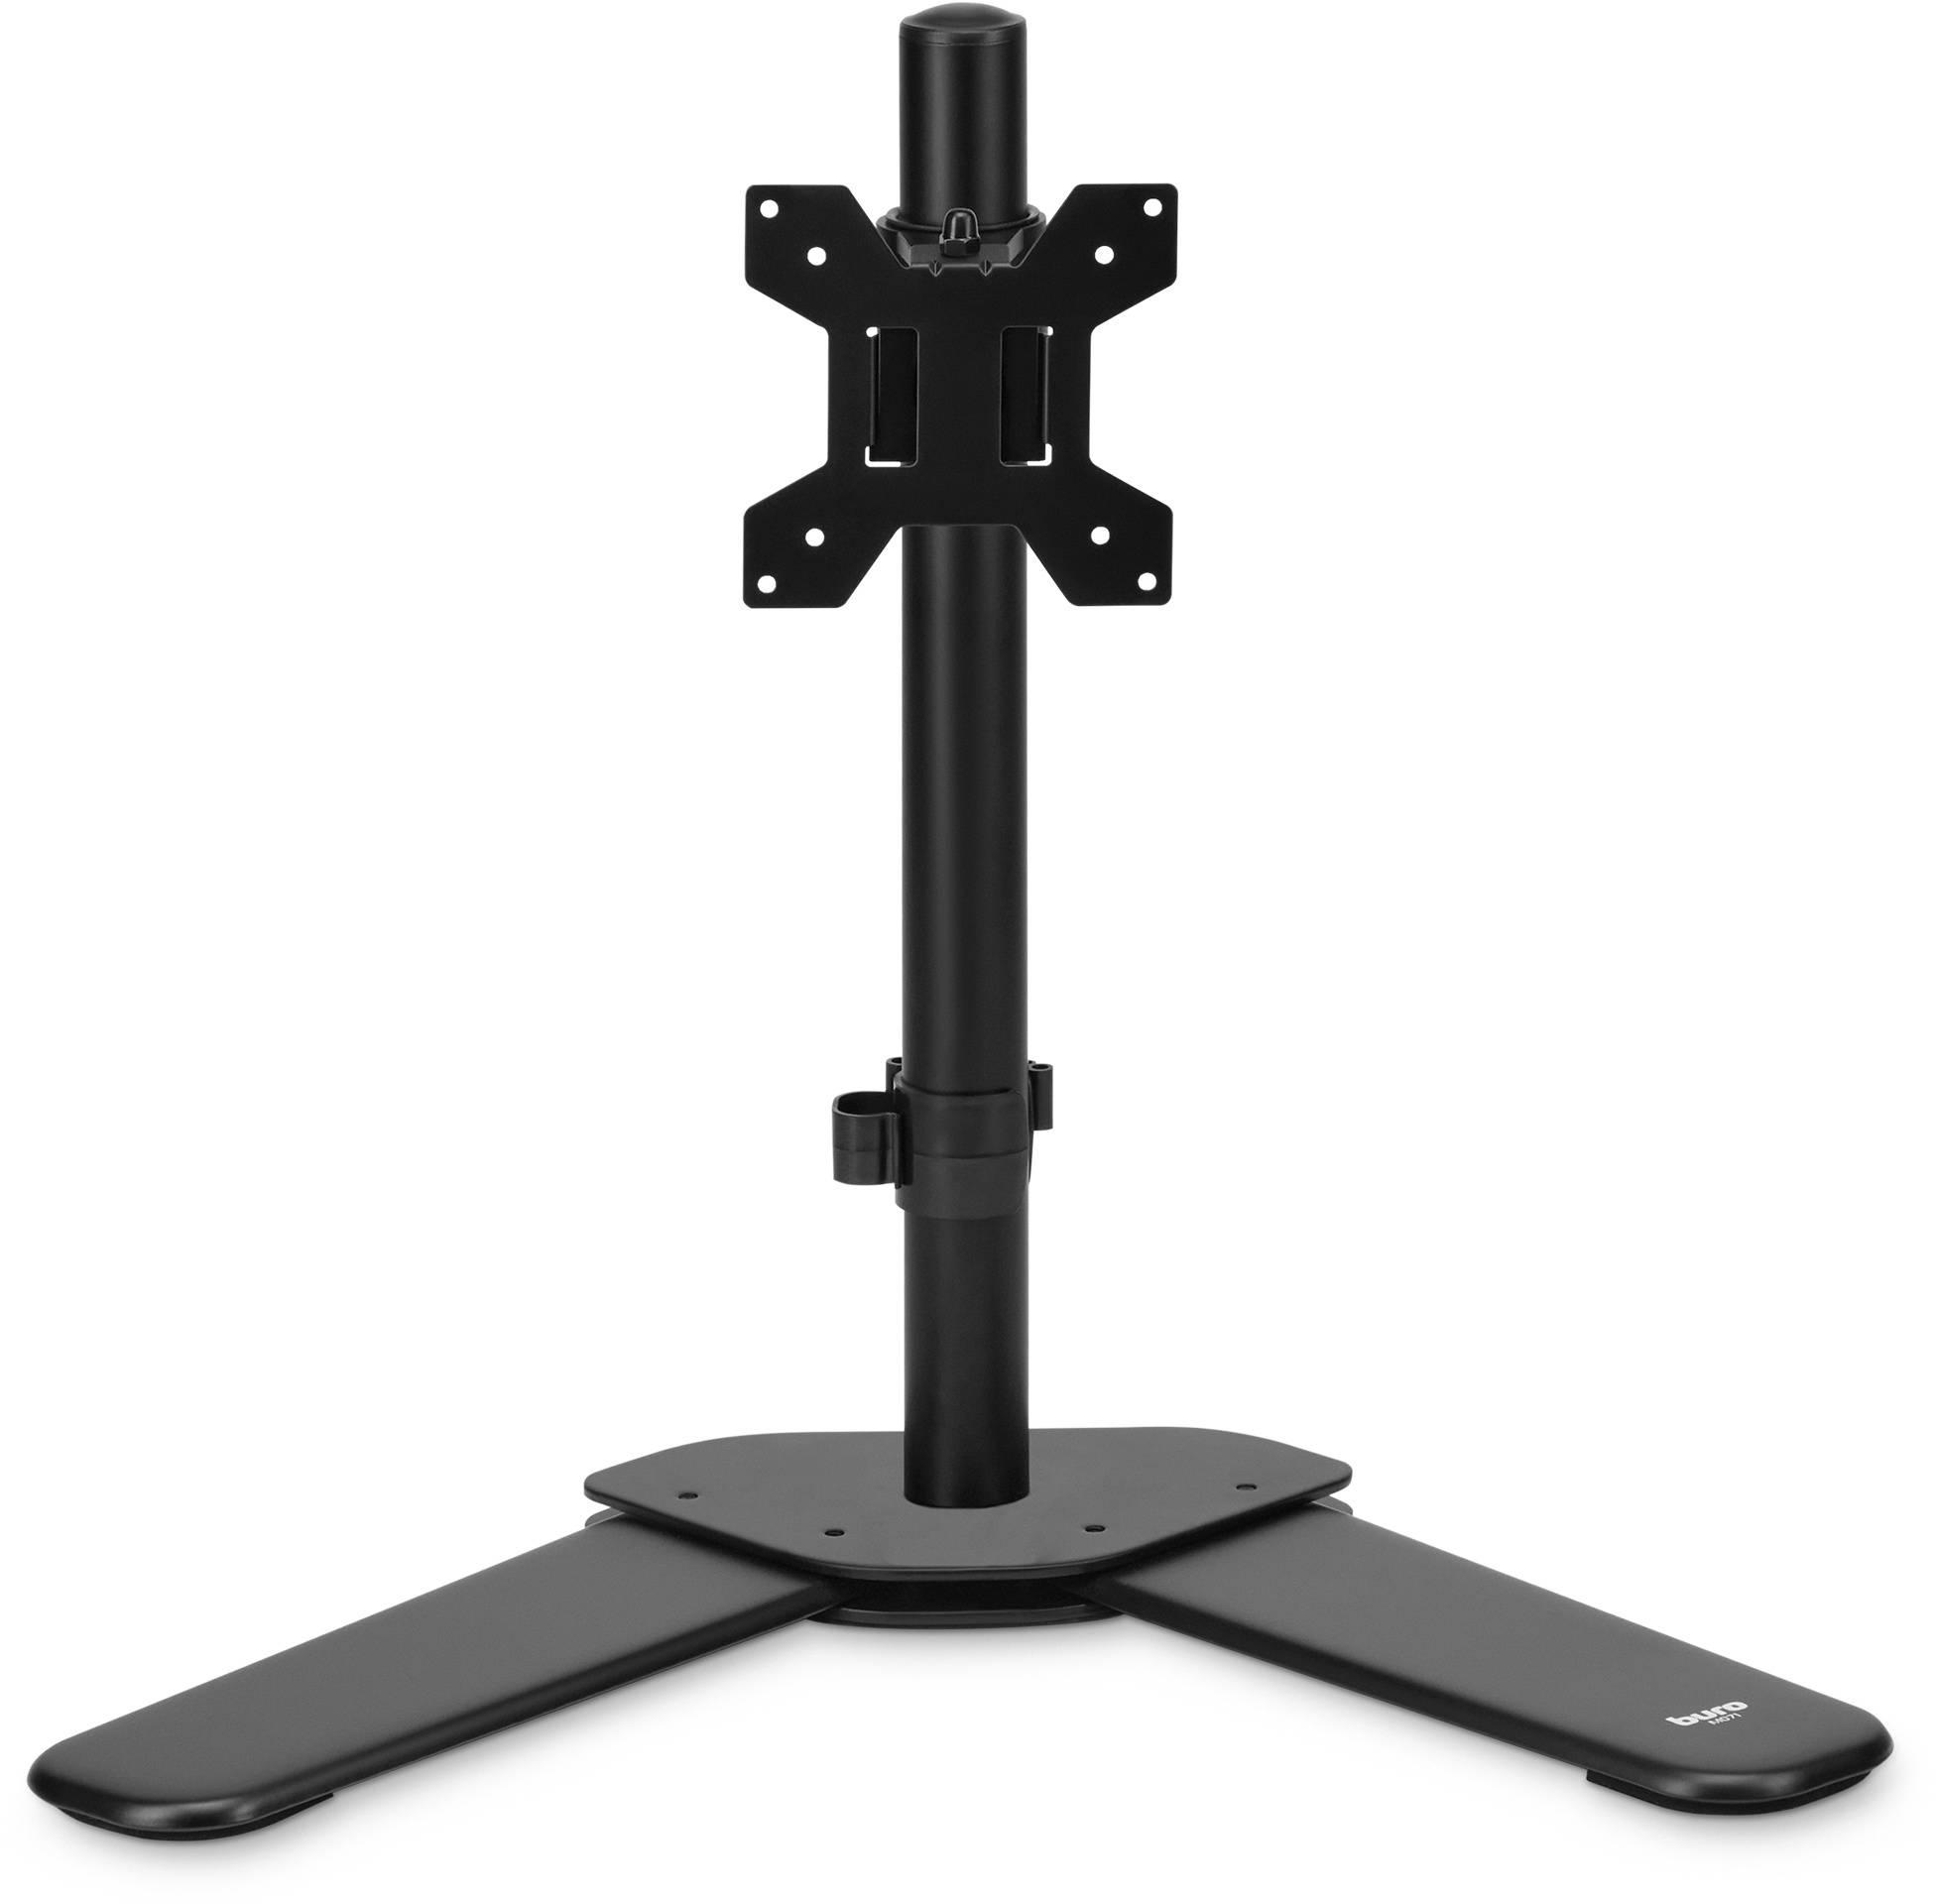 Кронштейн для монитора Buro M071 черный - фото 1